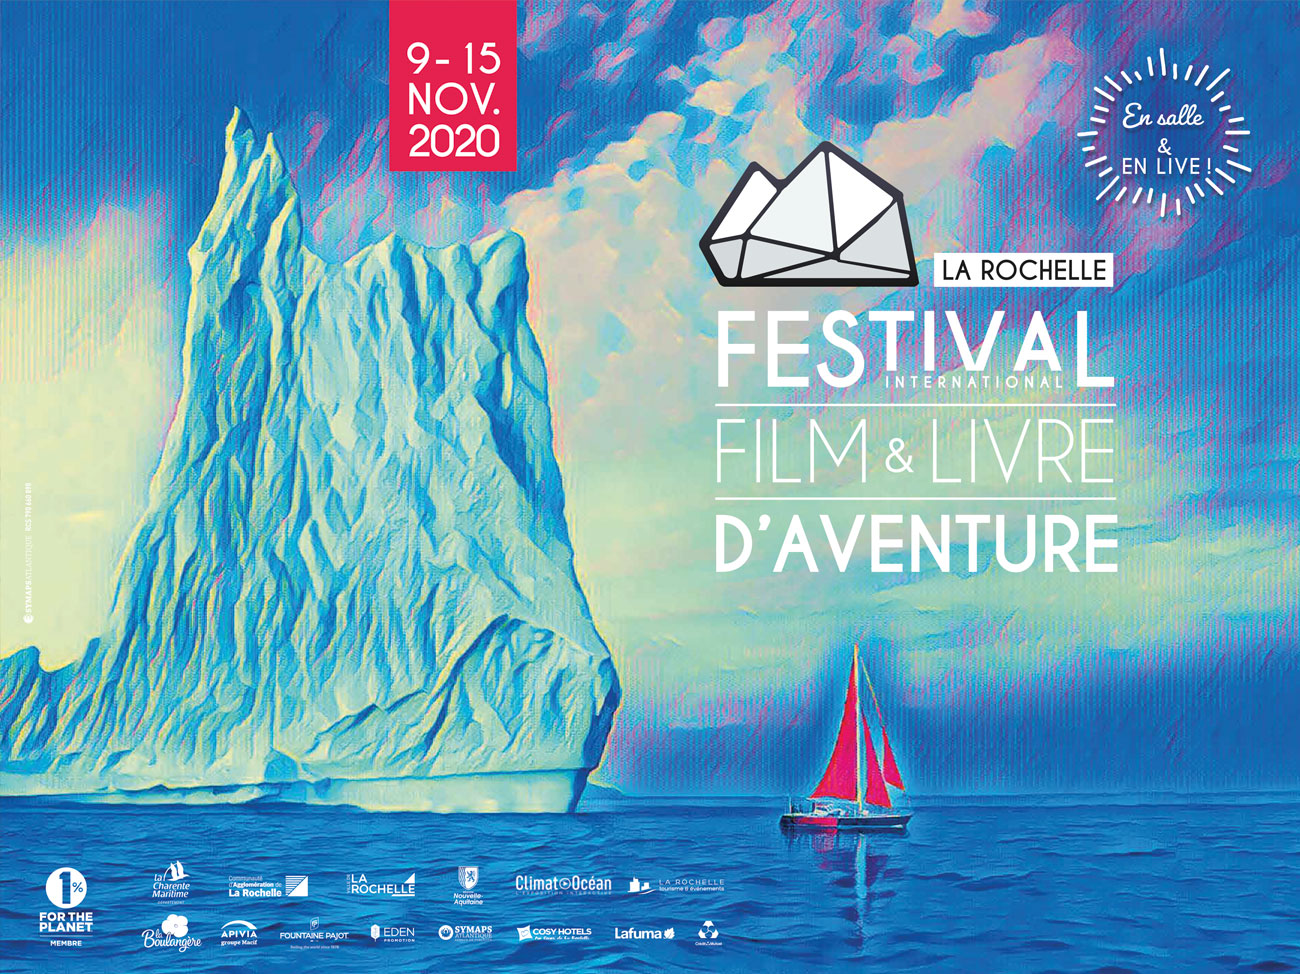 Festival international du film & livre d'aventure La Rochelle